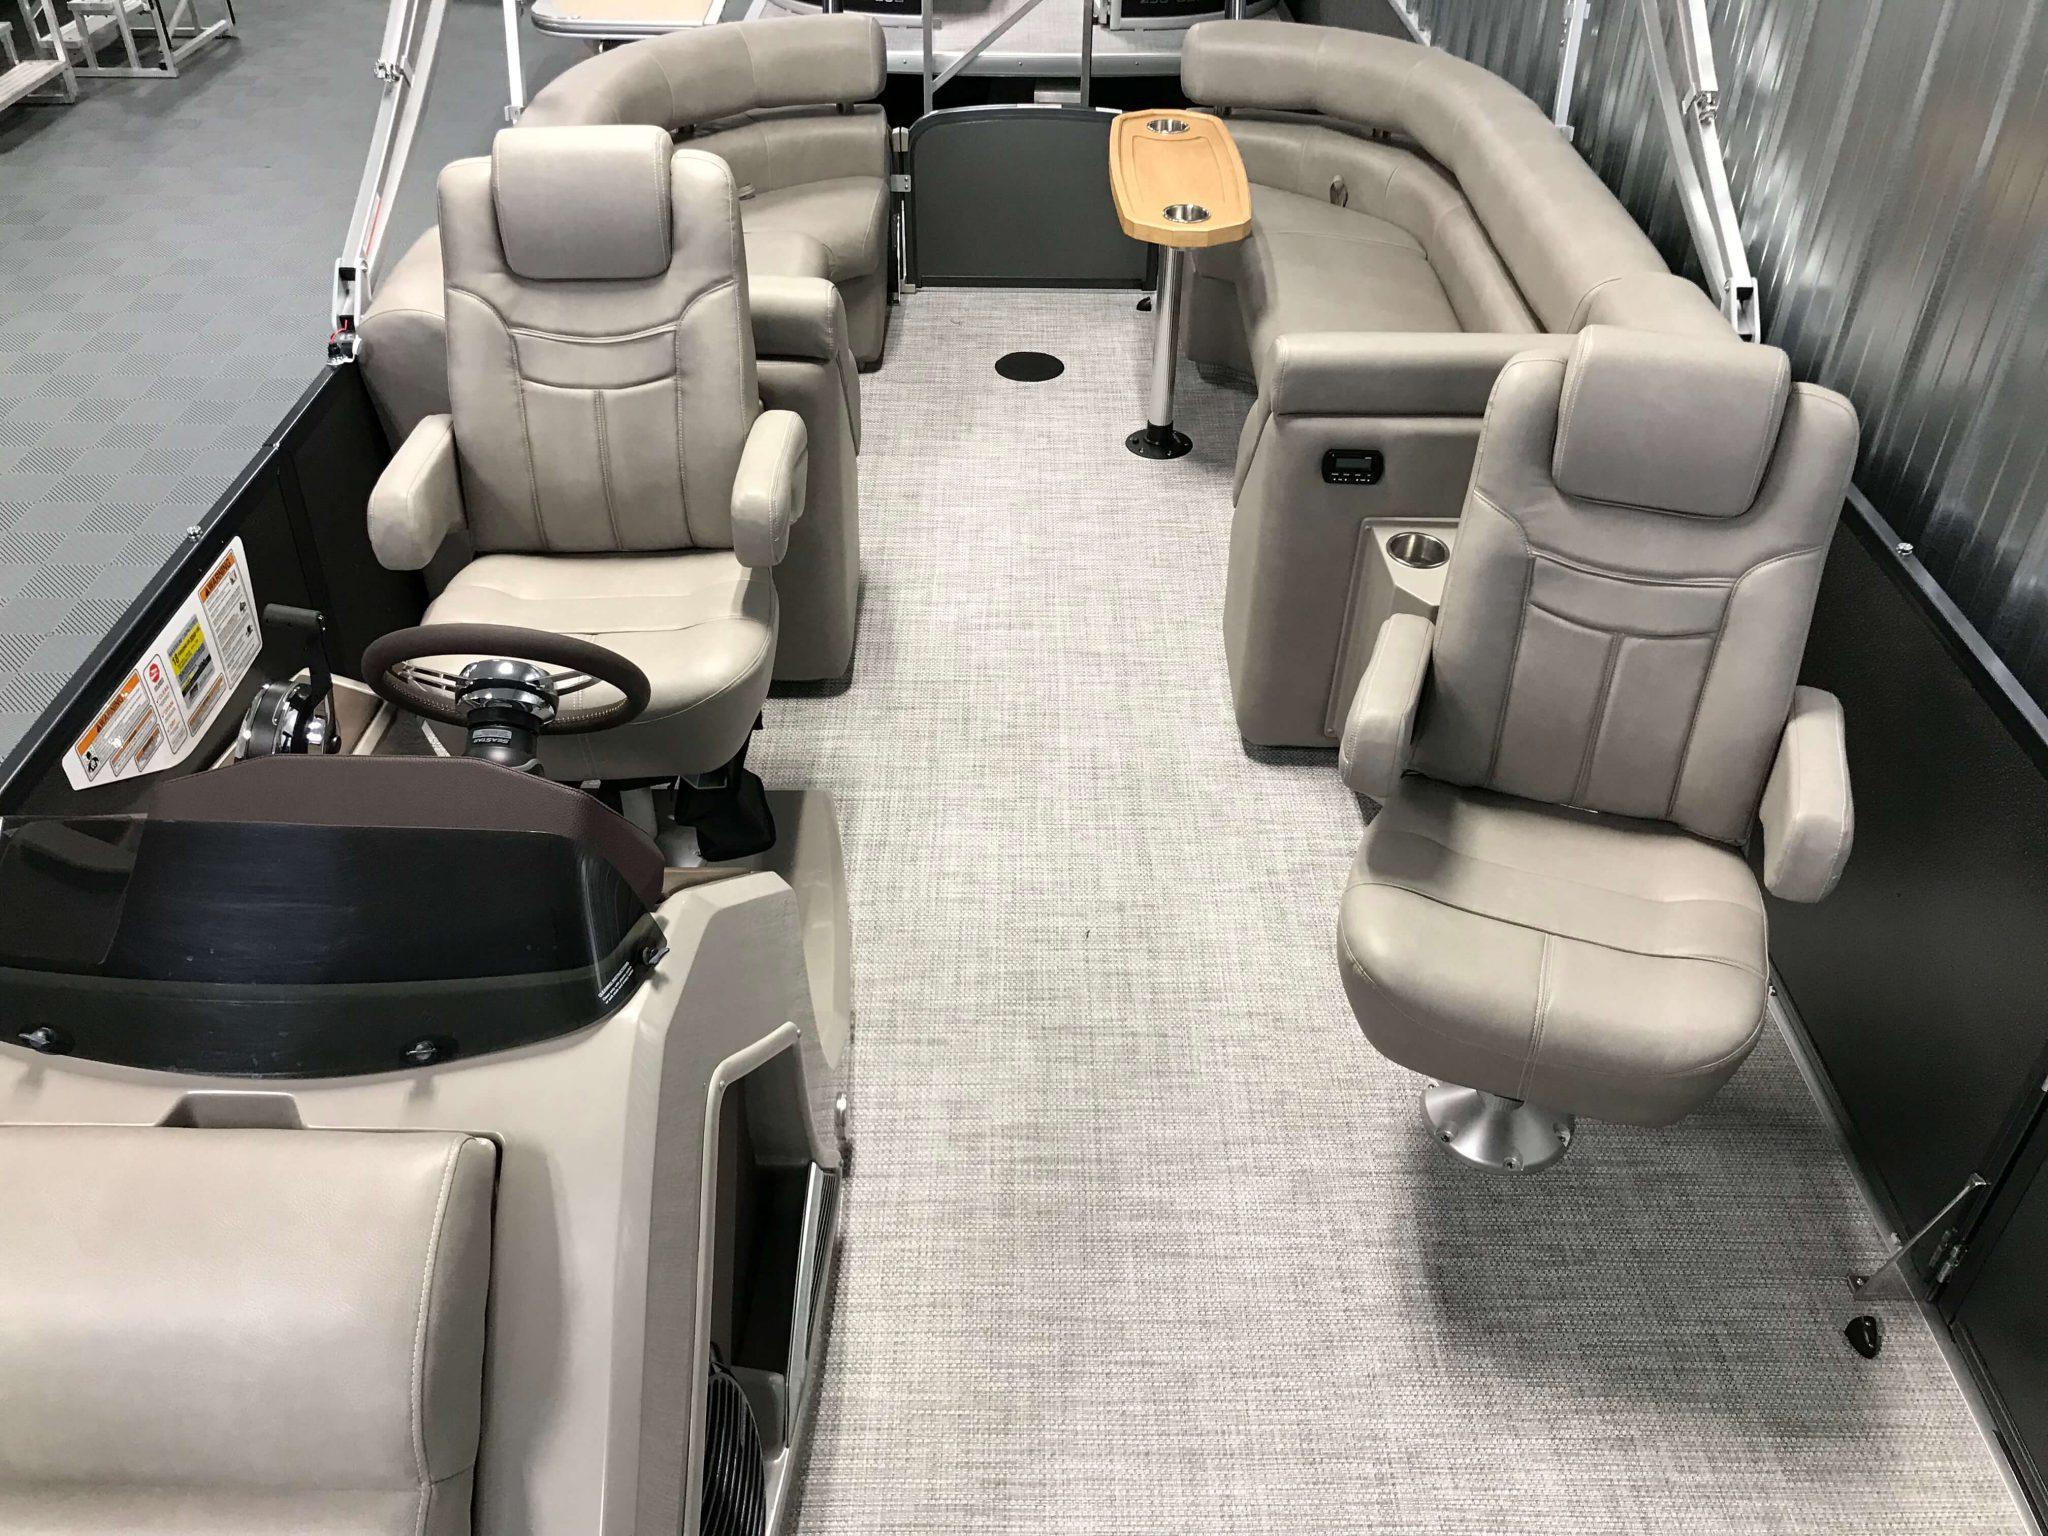 2019 Premier 250 Grand Majestic RF Tritoon Interior Cockpit Layout 3